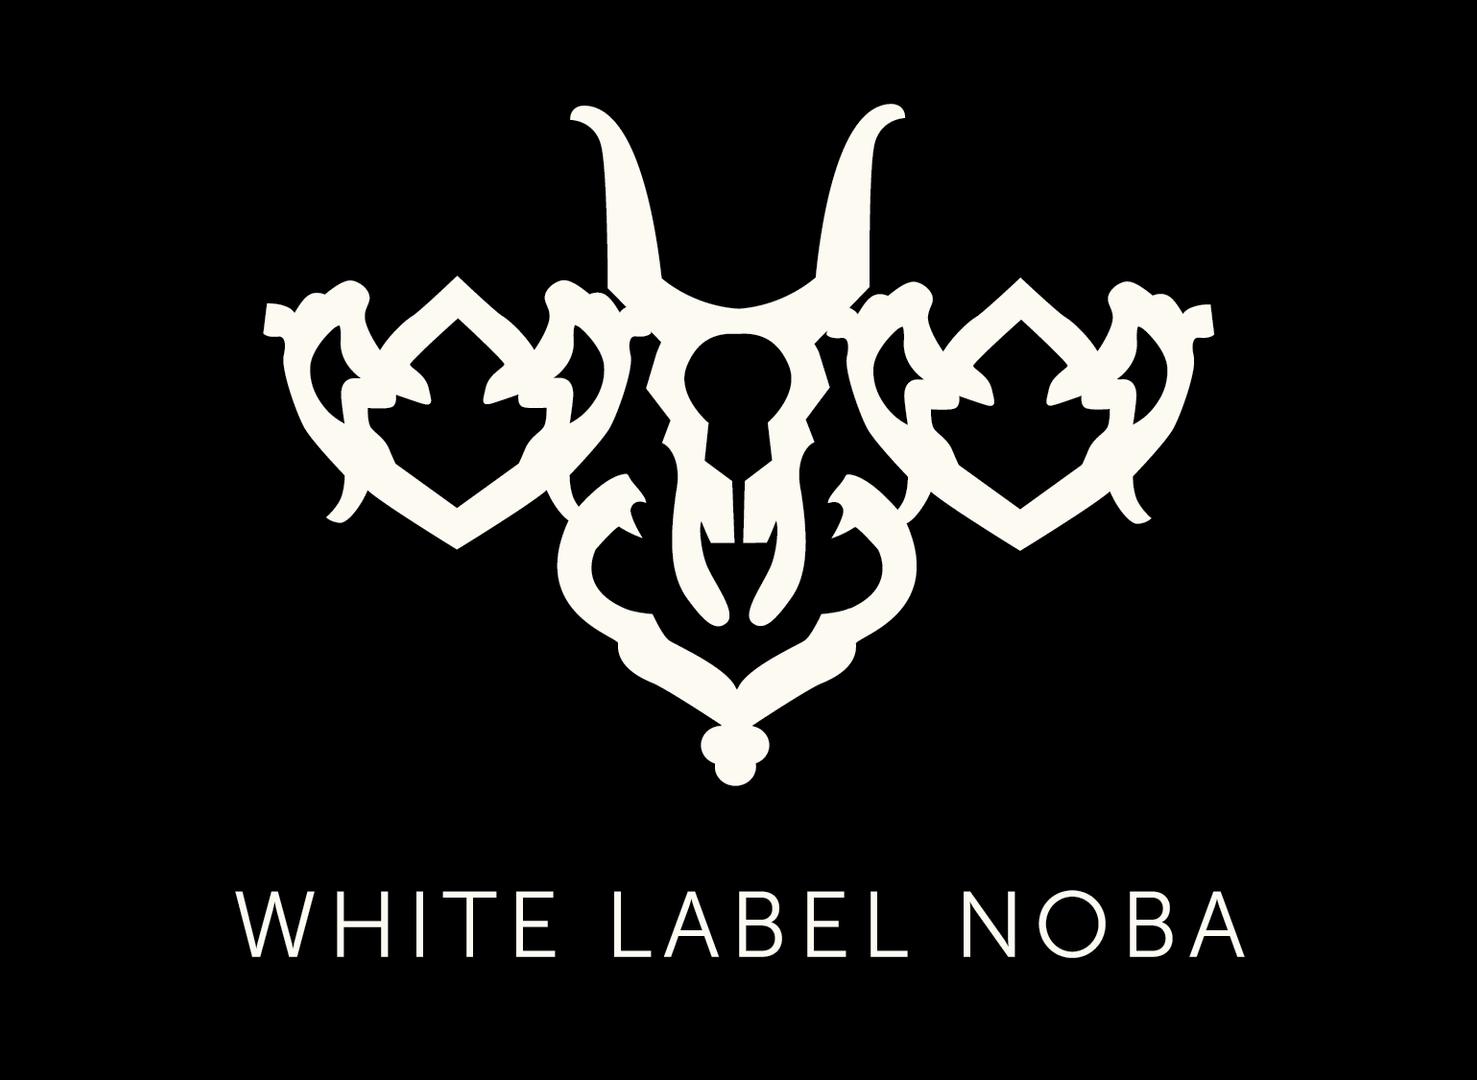 White Label Noba